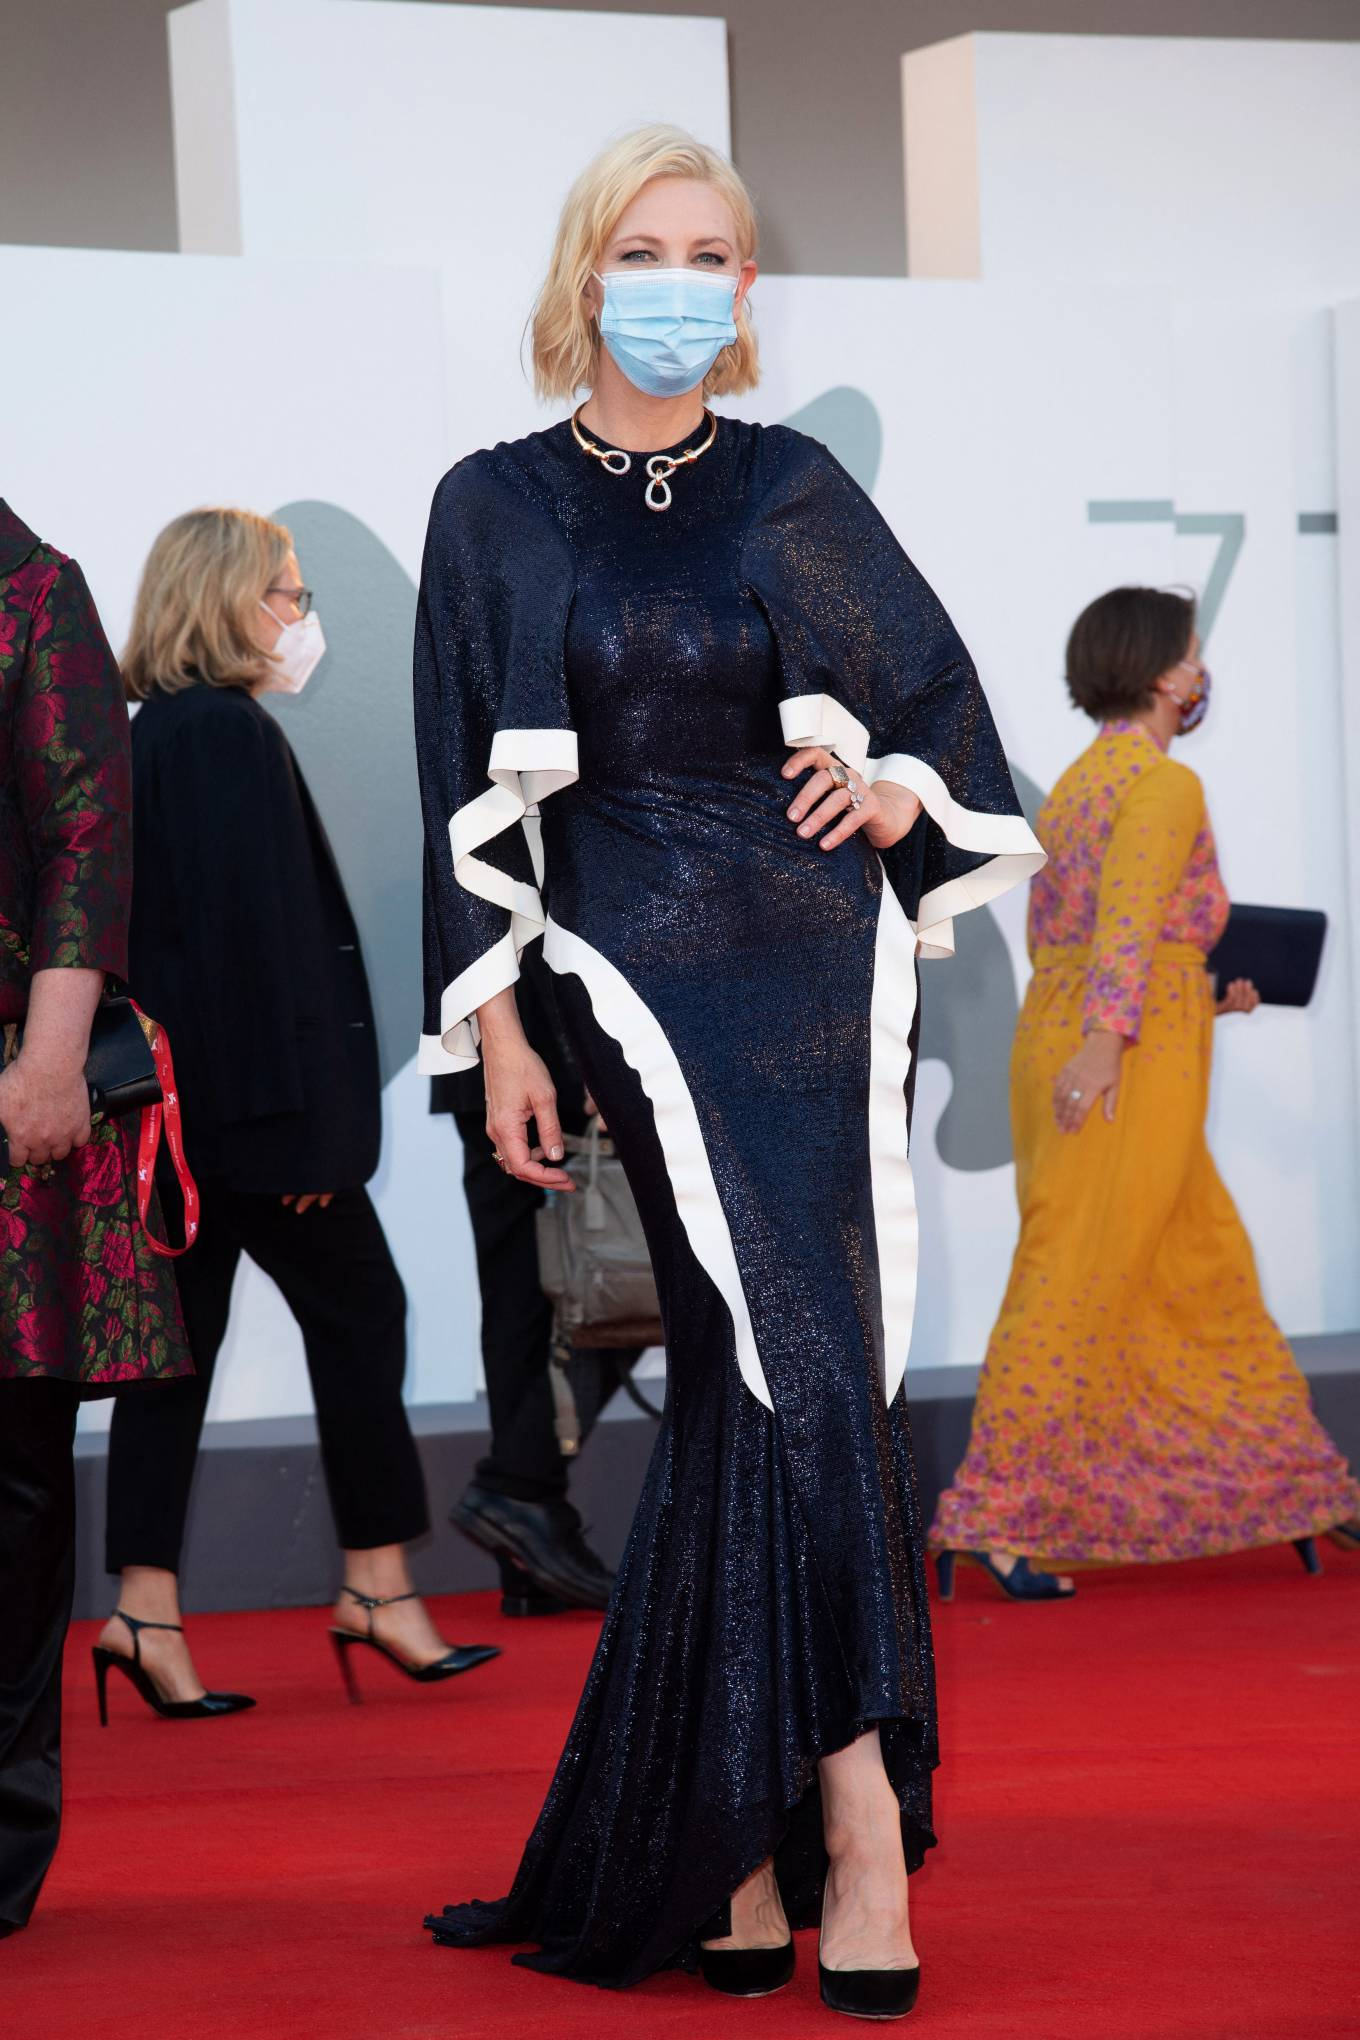 Cate Blanchett 2020 : Cate Blanchett attending Opening Ceremony at 2020 Venice International Film Festival – Italy-11